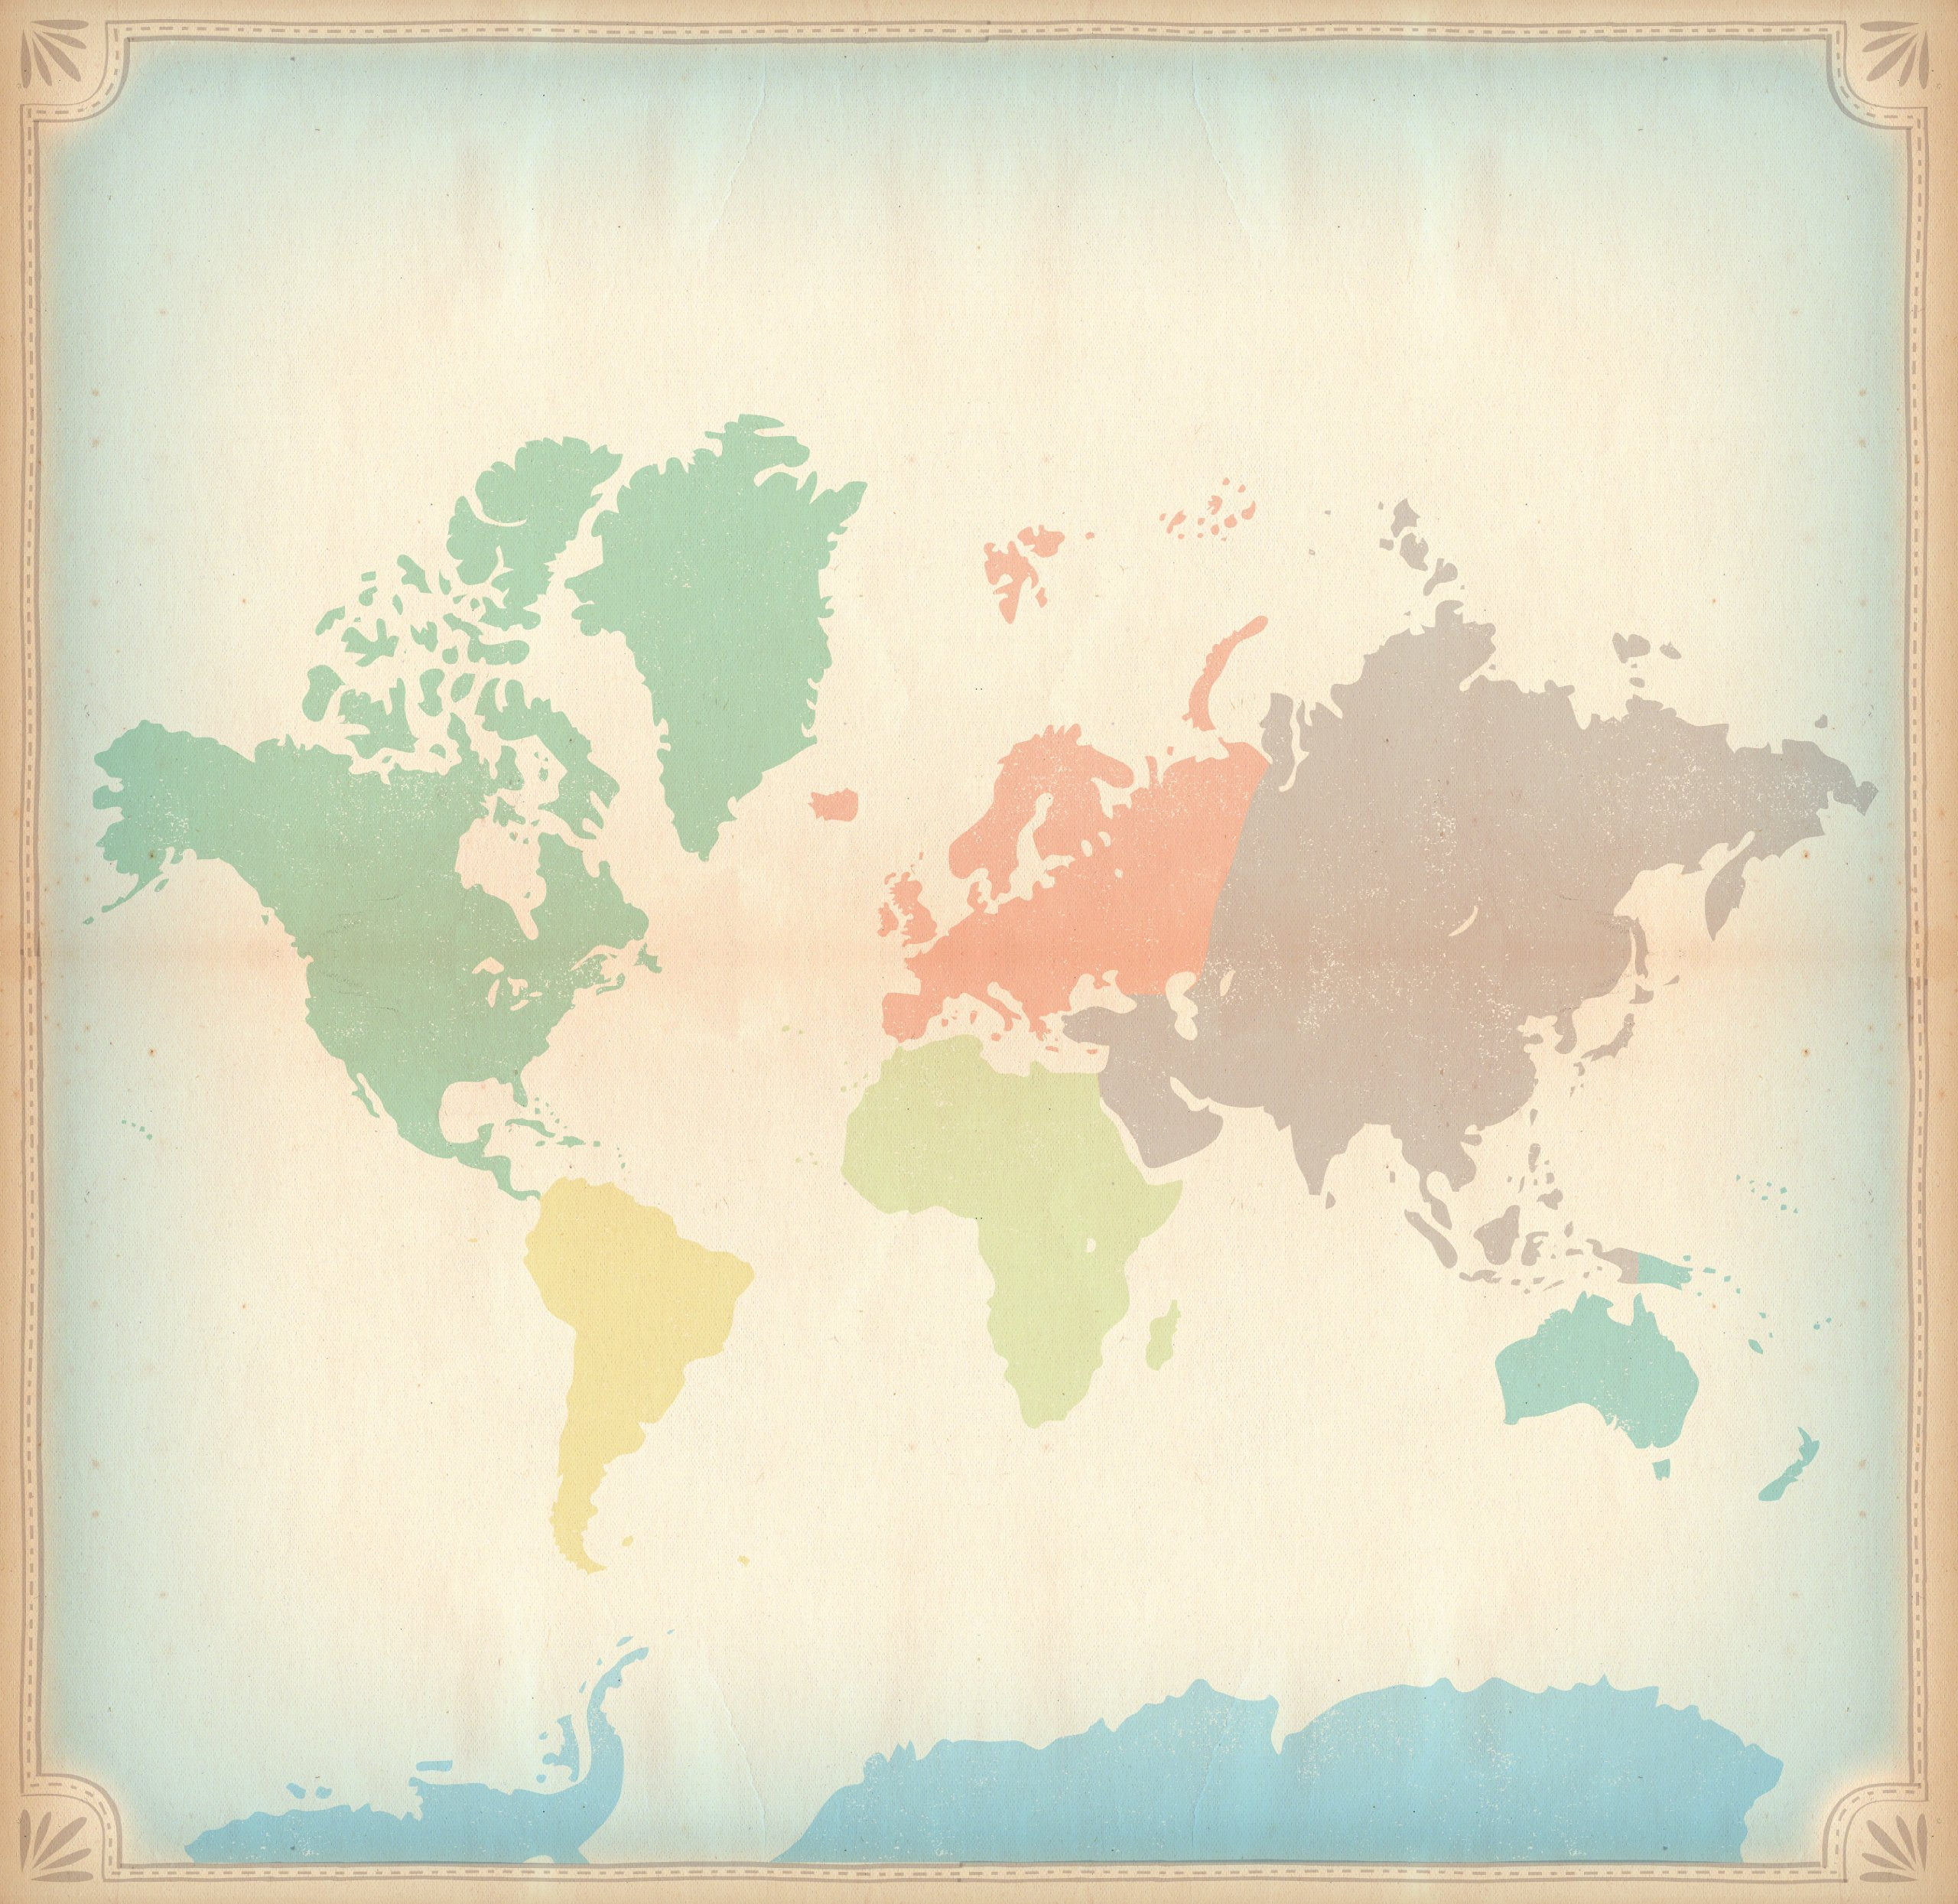 Make map art creatively illustrate your world salli sue swindell make map art creatively illustrate your world salli sue swindell nate padavick 9781452123332 amazon books gumiabroncs Images